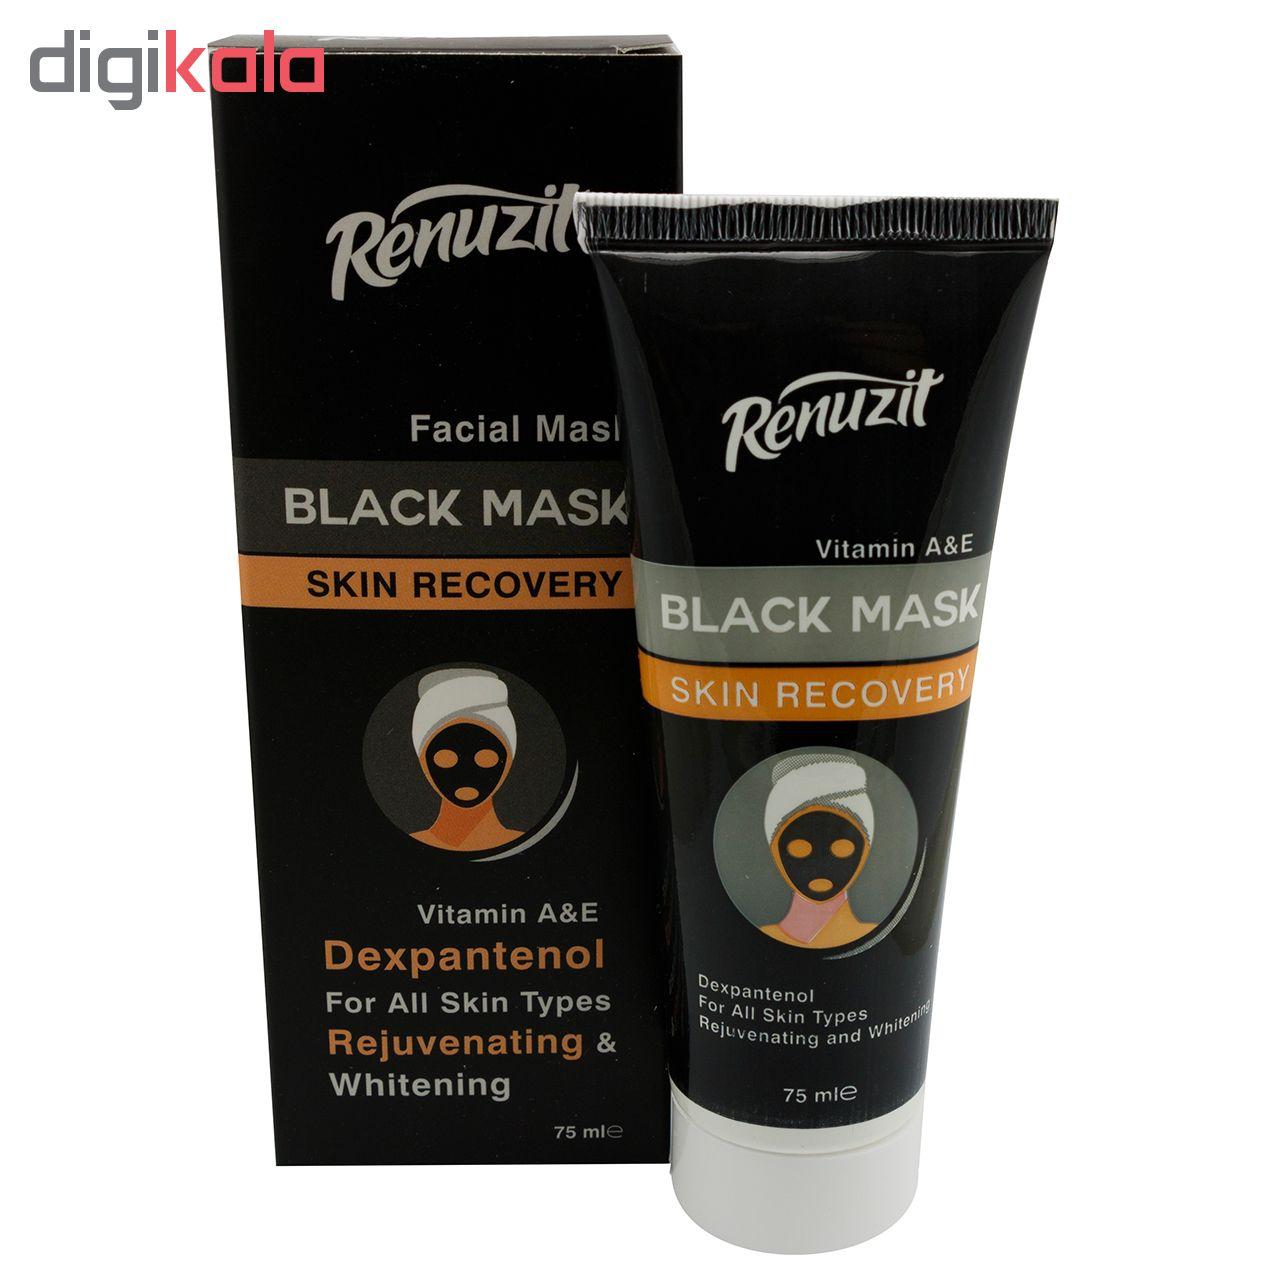 ماسک صورت رینو زیت مدل Black mask carbon active حجم 75 میلی لیتر -  - 3